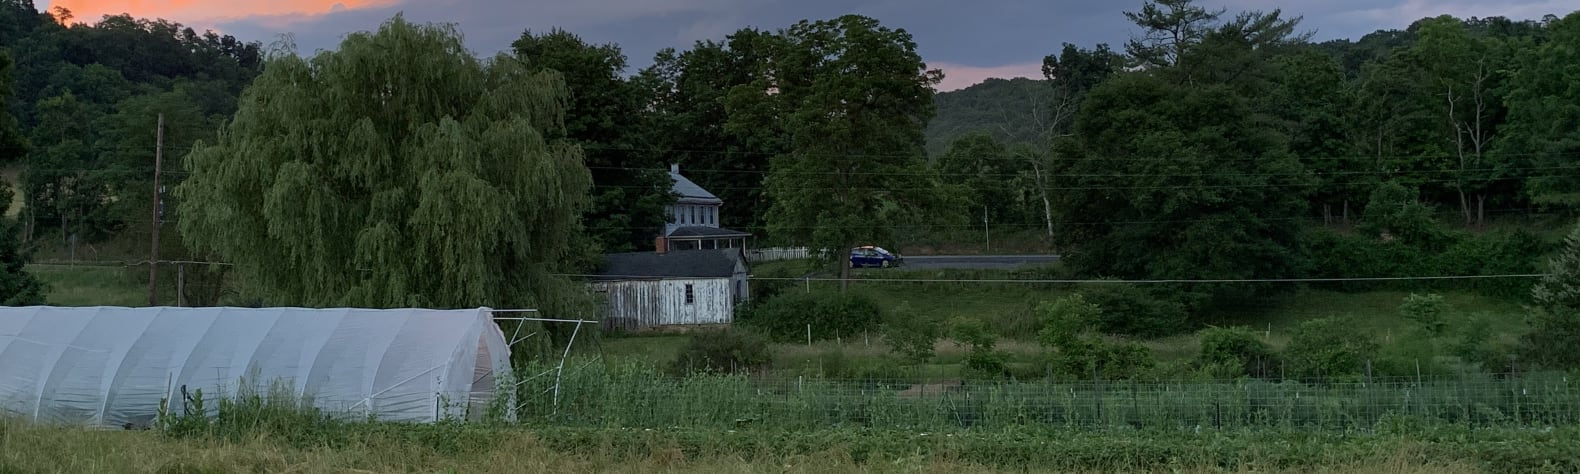 Baken Creek Farm